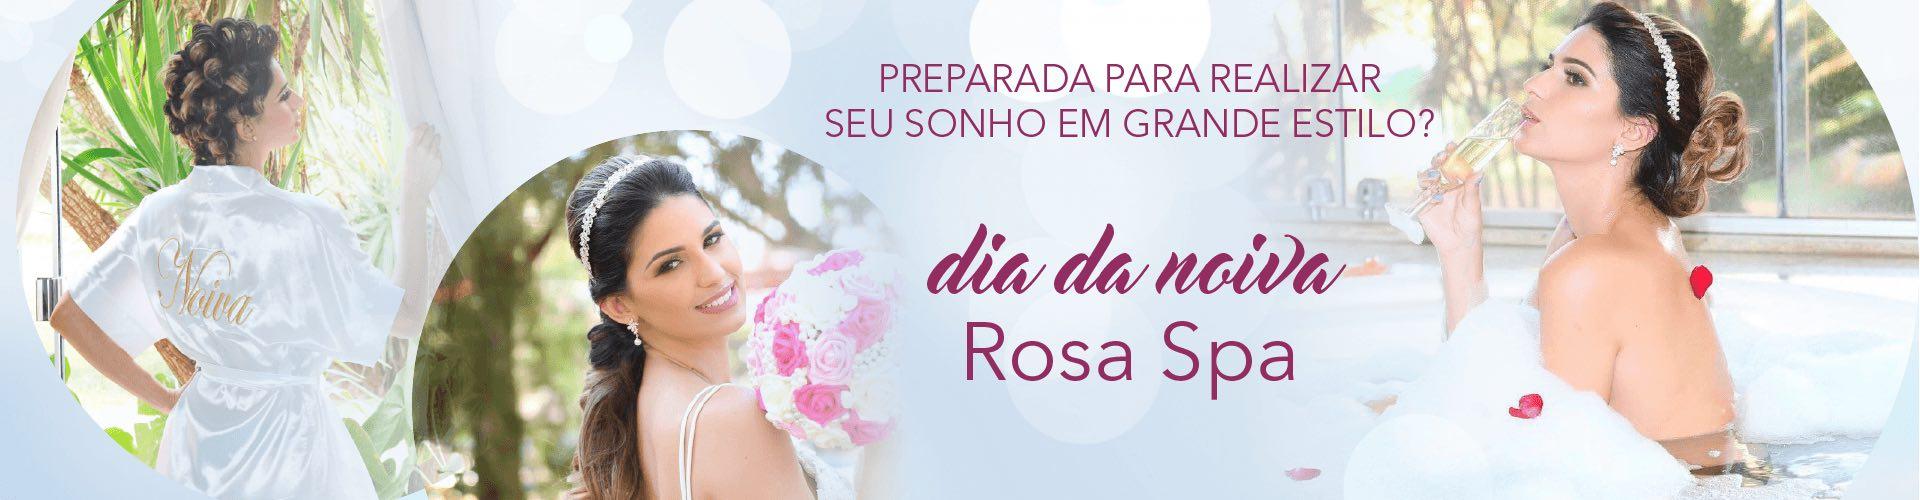 rosa-spa-dia-da-noiva-10171918.jpg